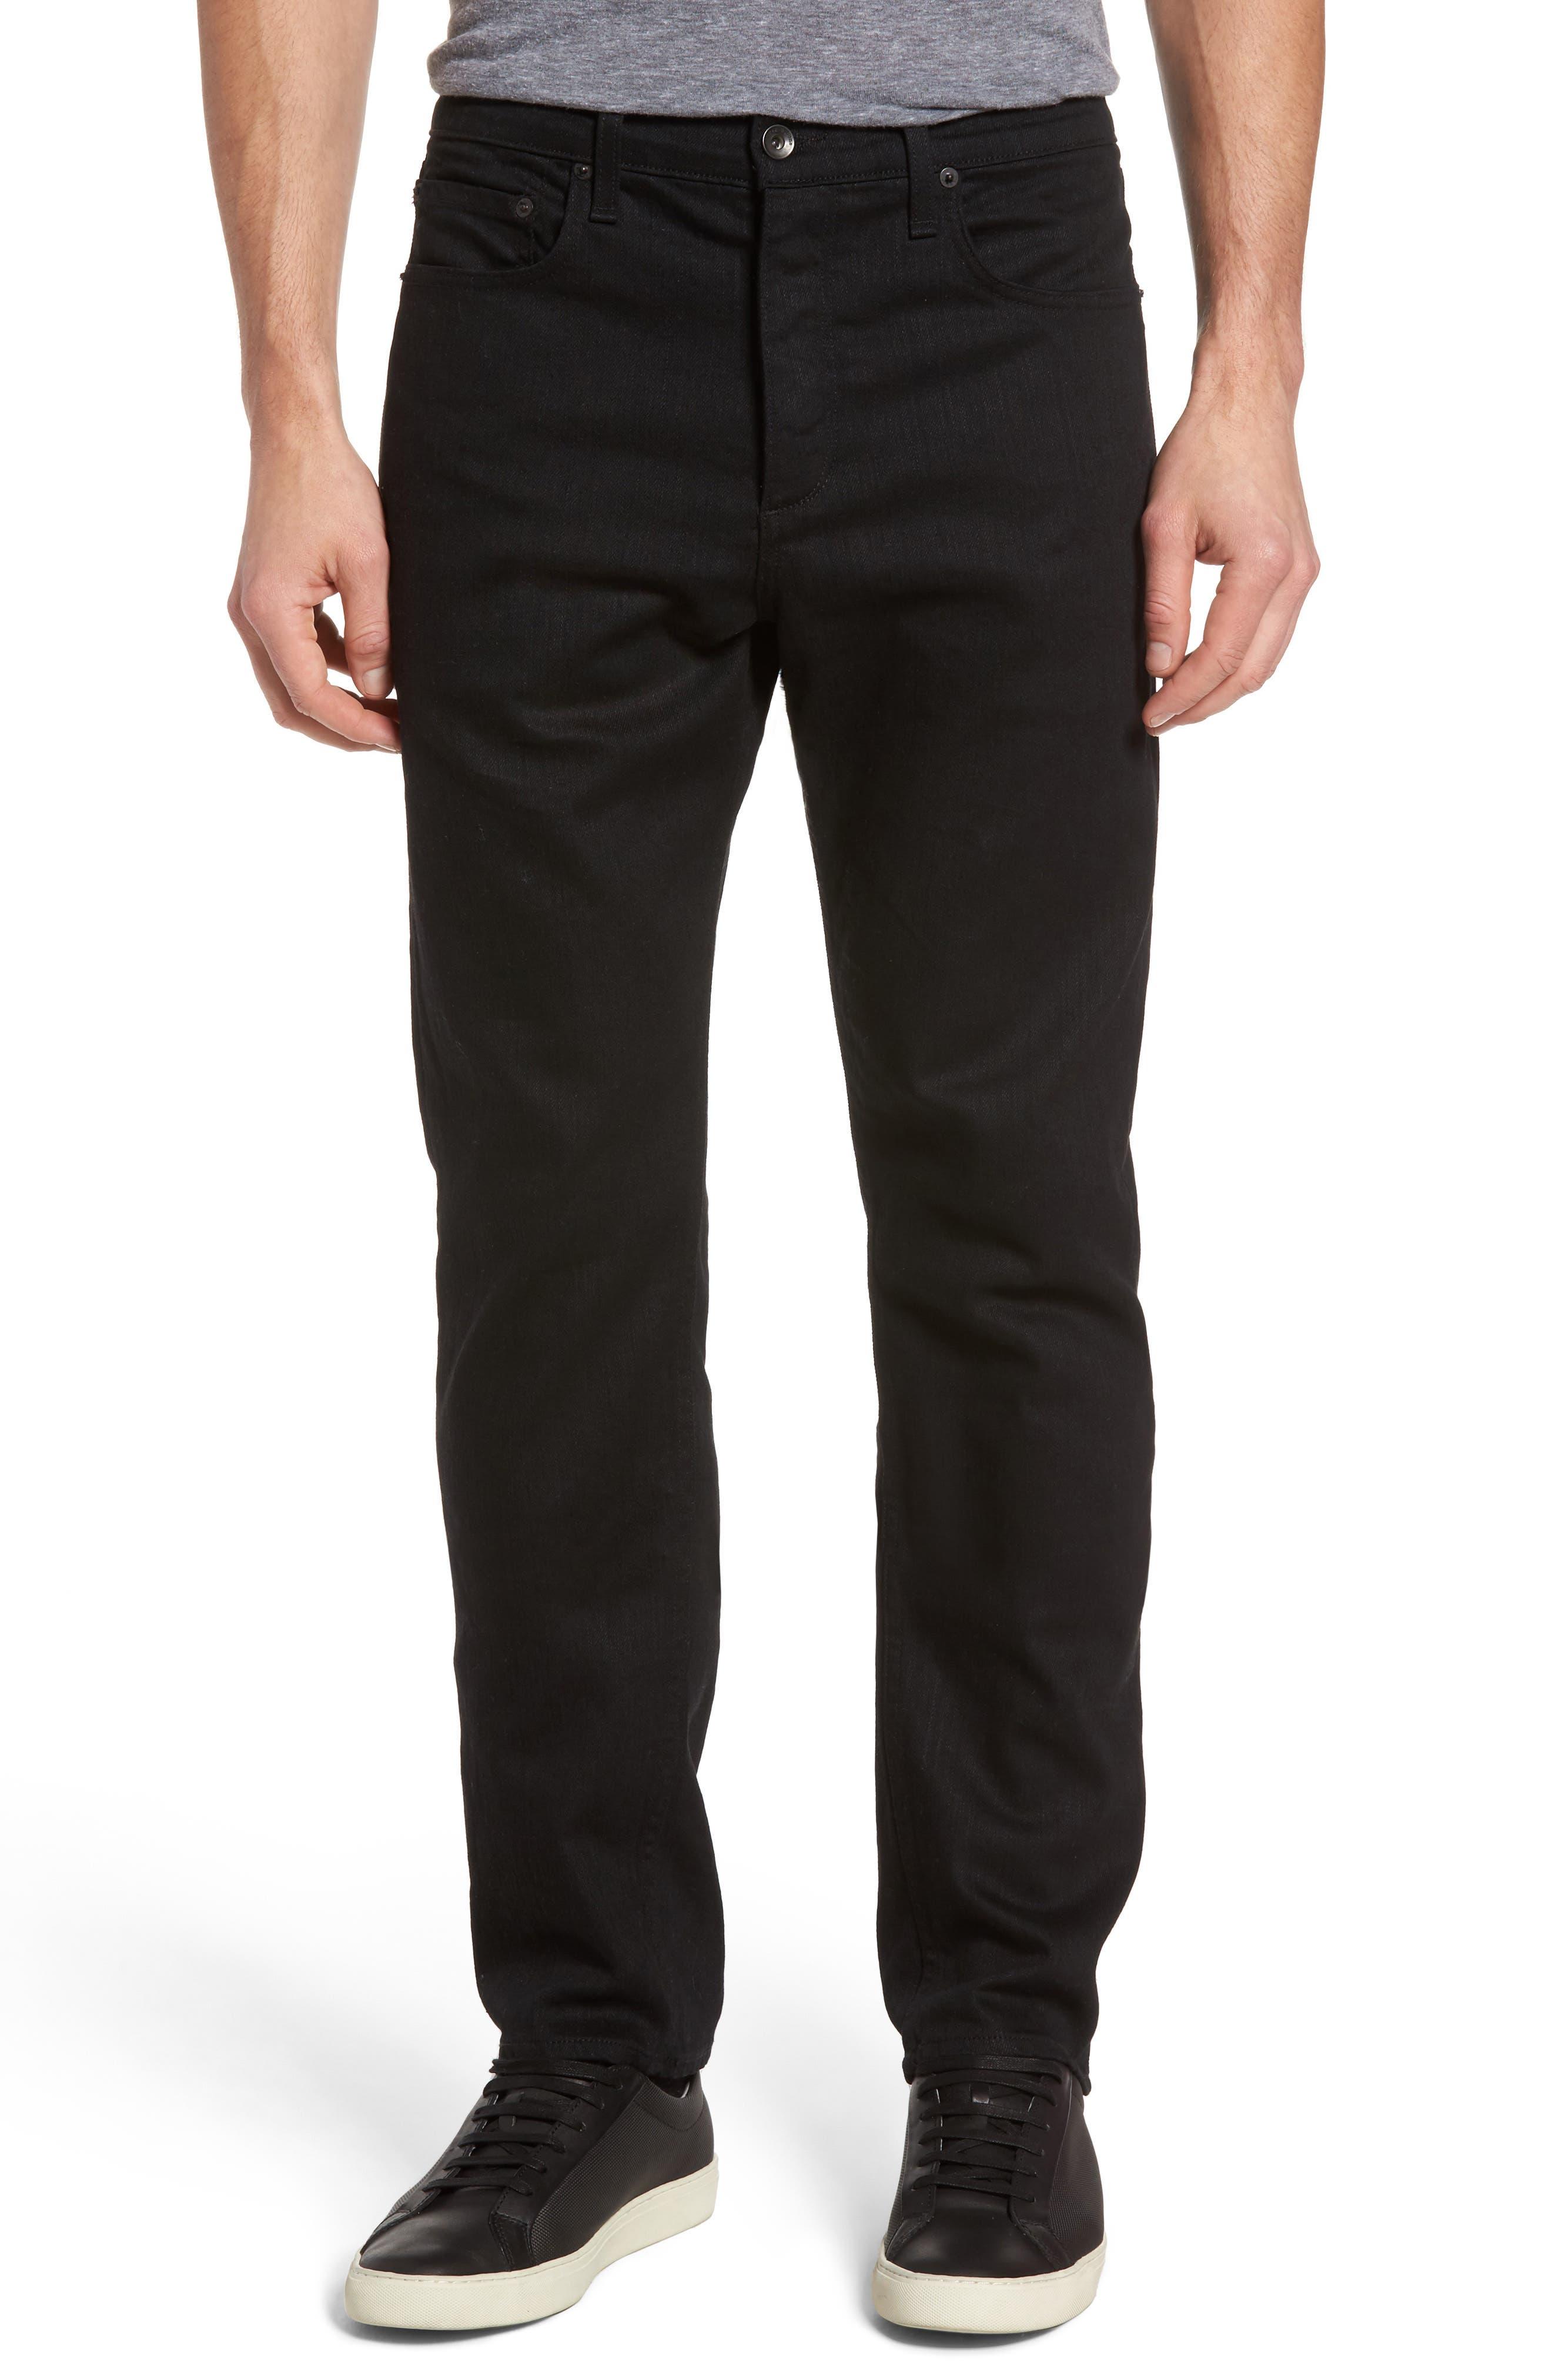 RAG & BONE, Fit 3 Slim Straight Leg Jeans, Main thumbnail 1, color, BLACK